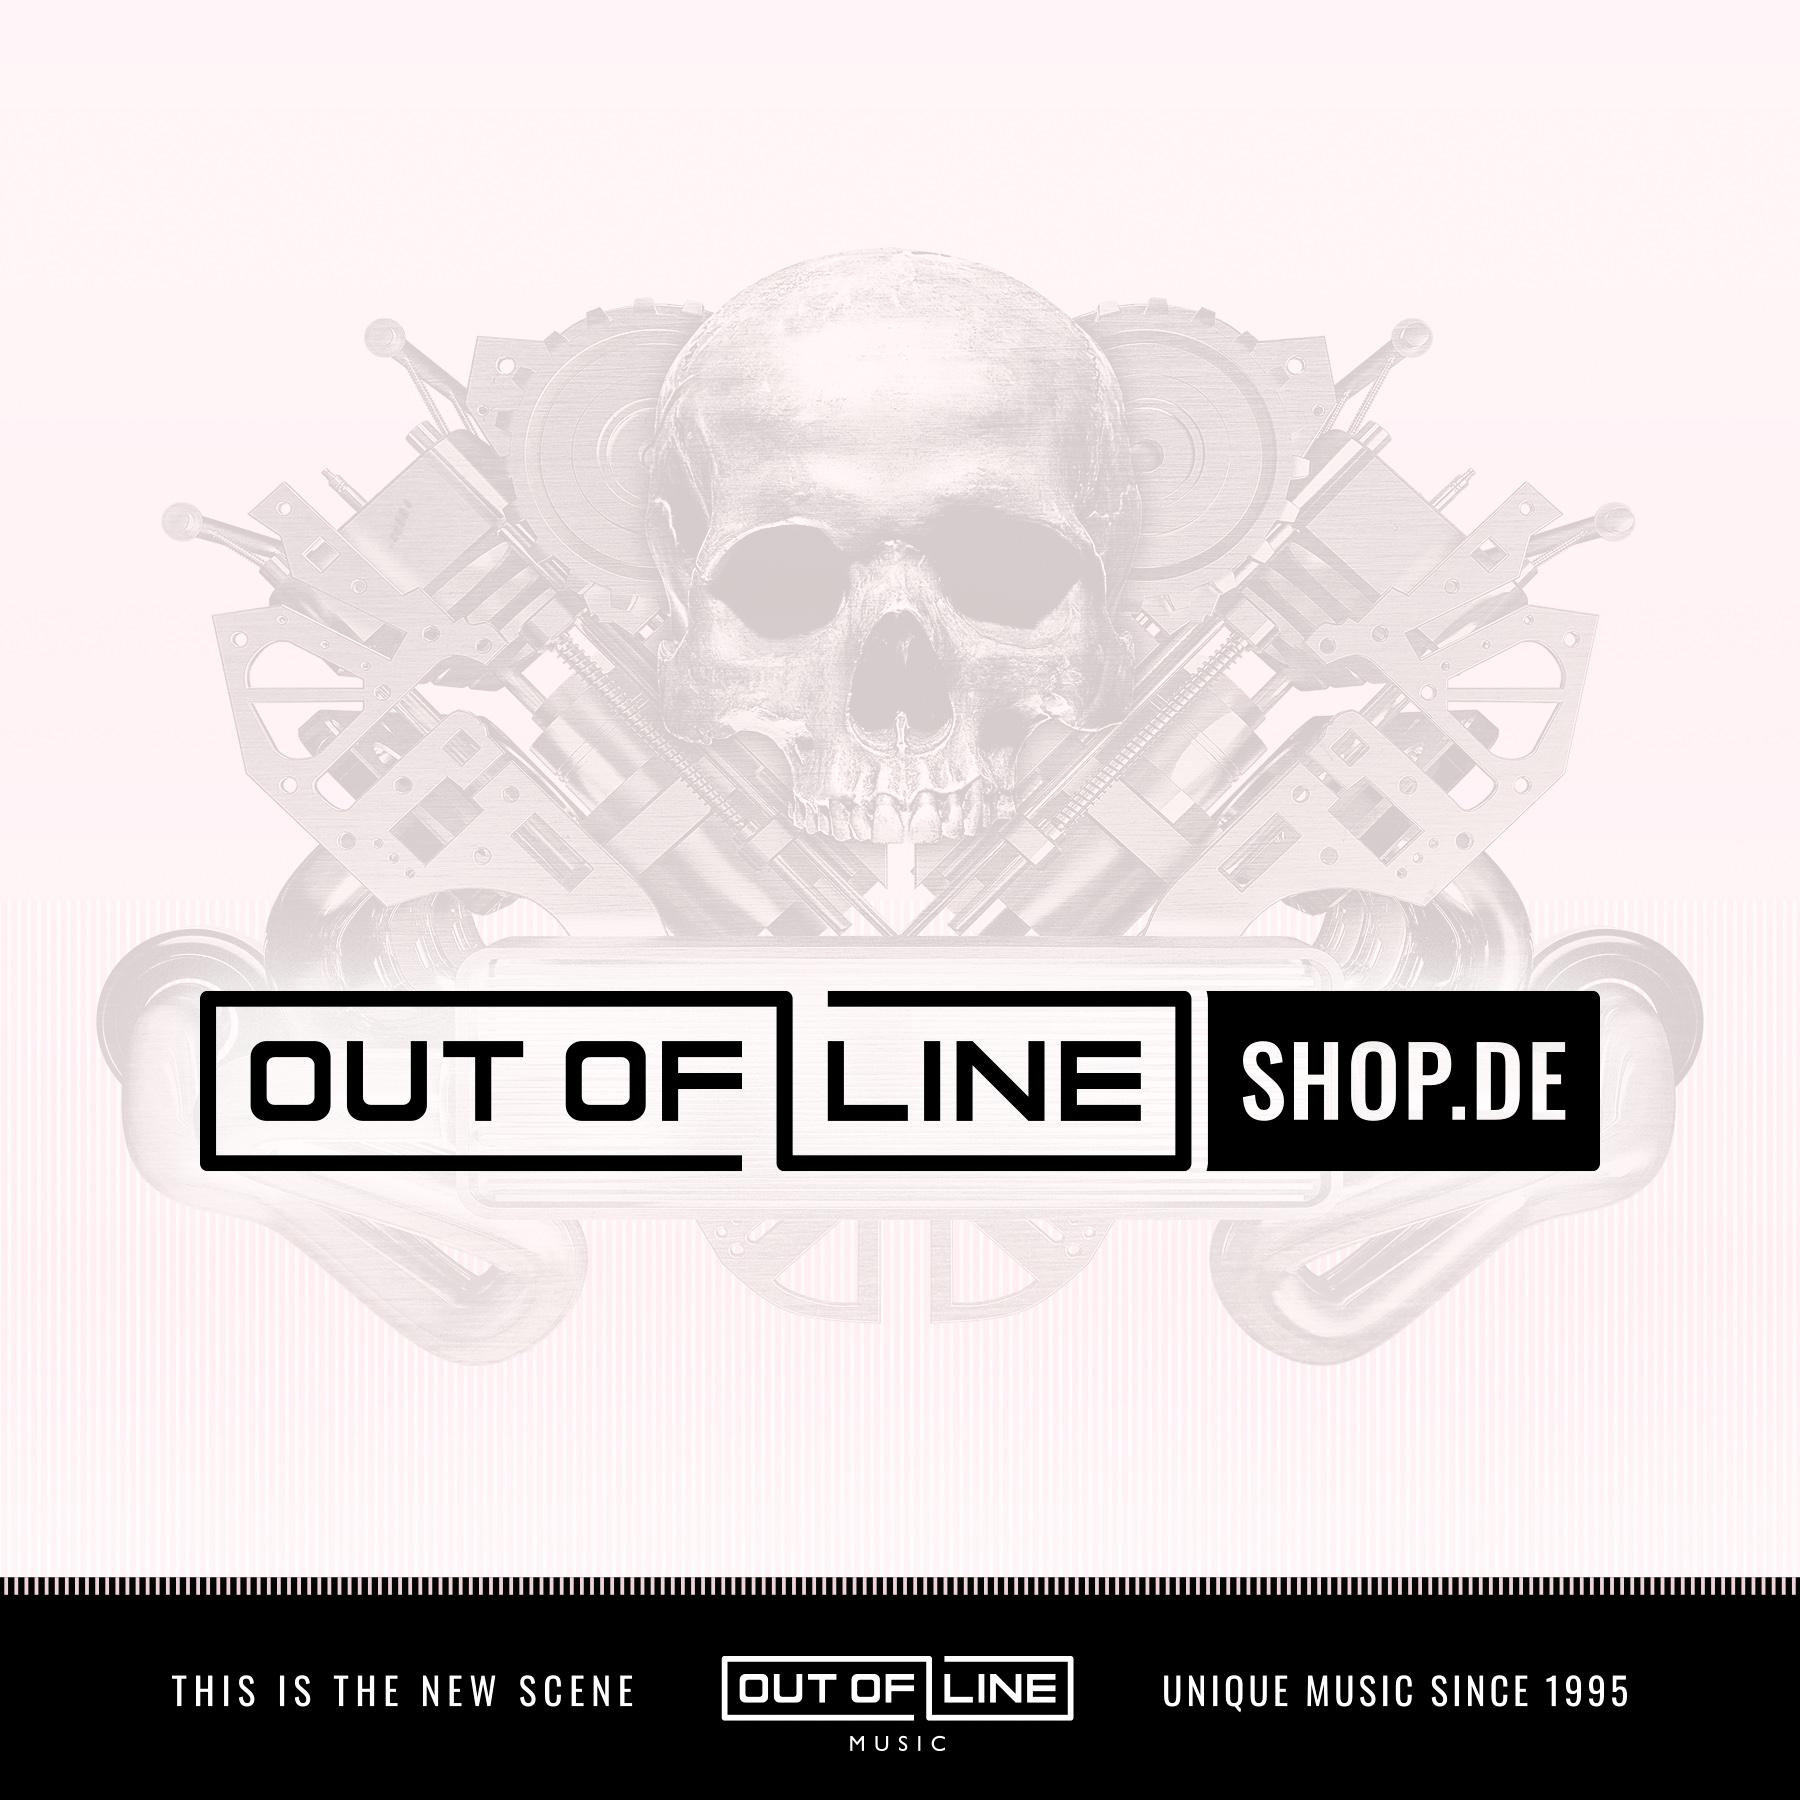 Atrocity - Okkult II (Limited Mediabook) - 2CD